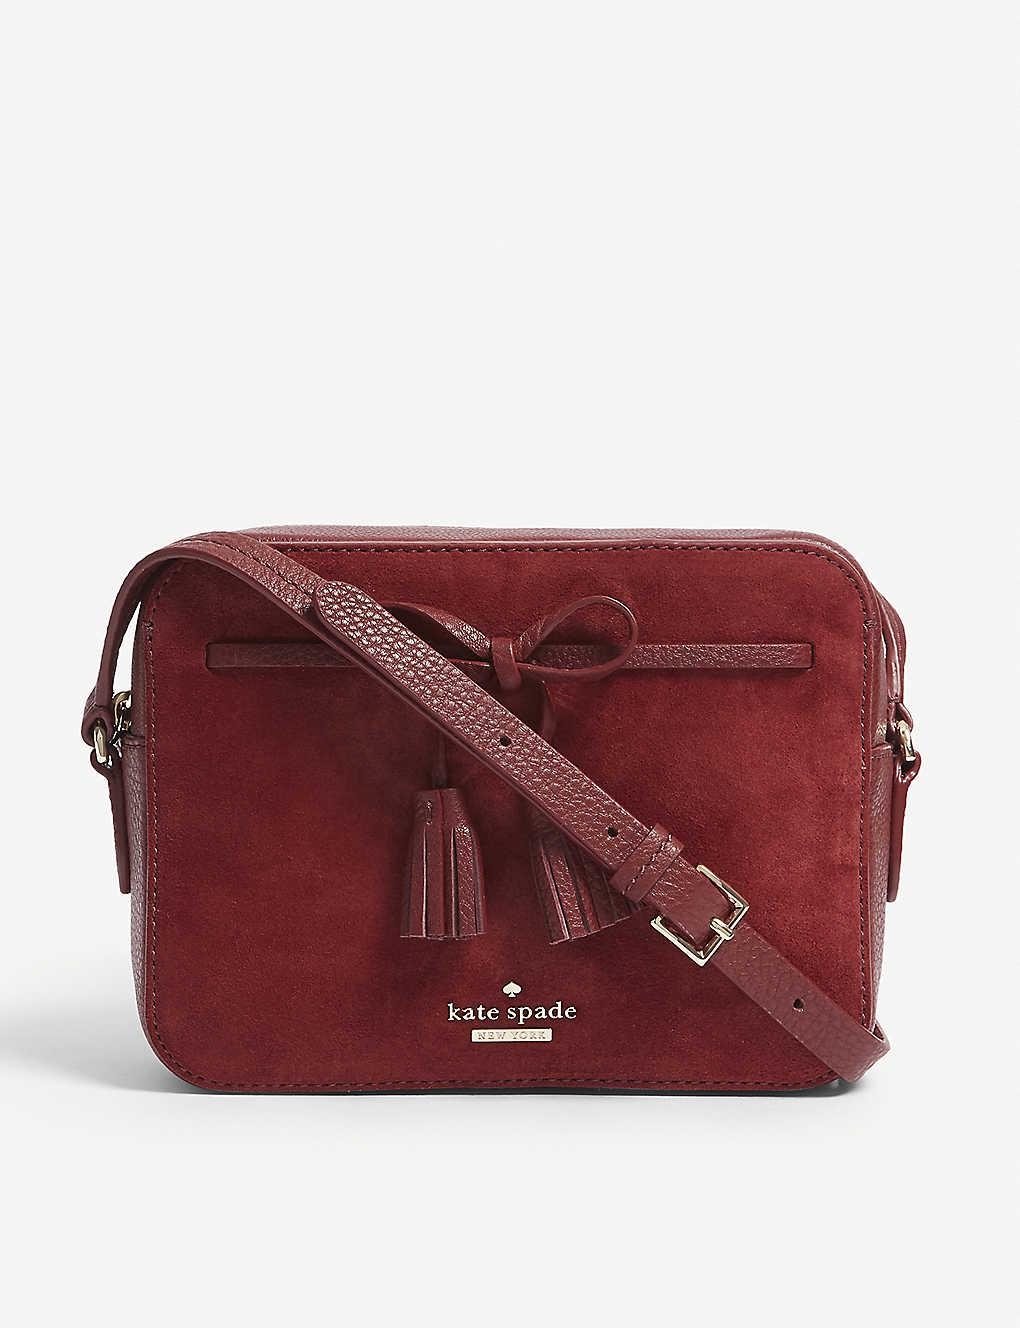 28d4d0611 KATE SPADE NEW YORK - Hayes Street Arla leather cross-body bag ...